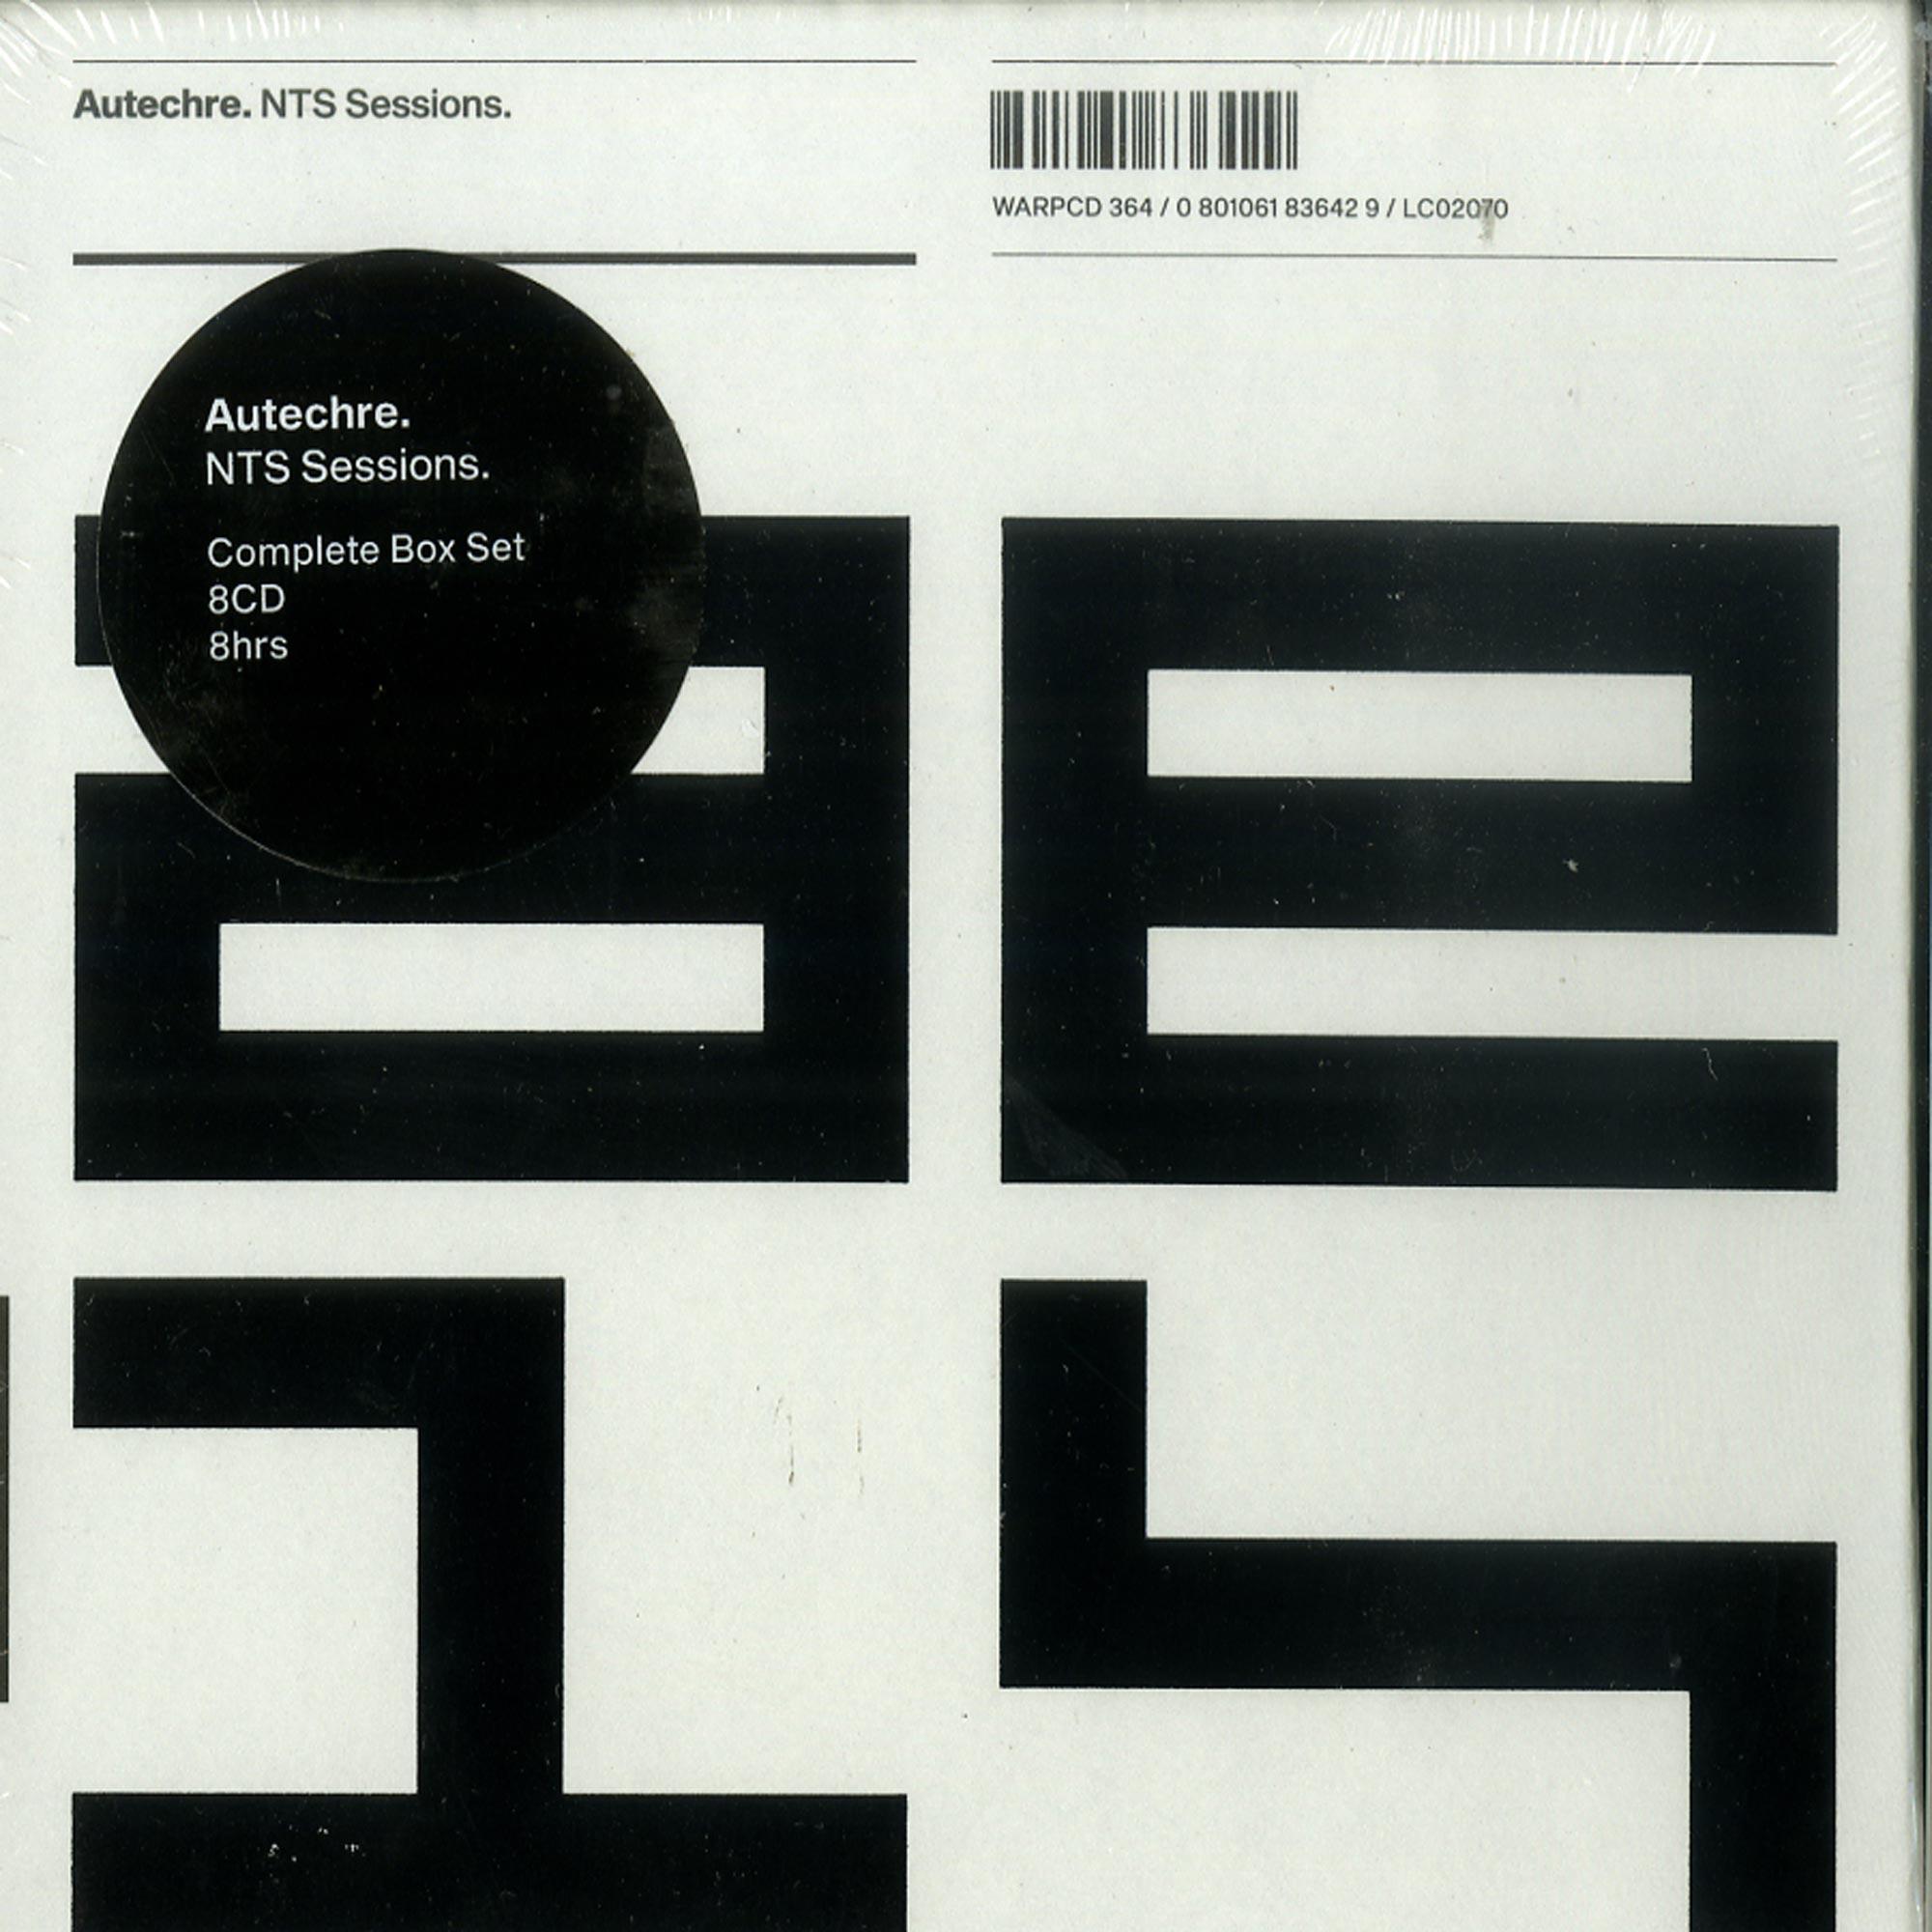 Autechre - NTS SESSIONS